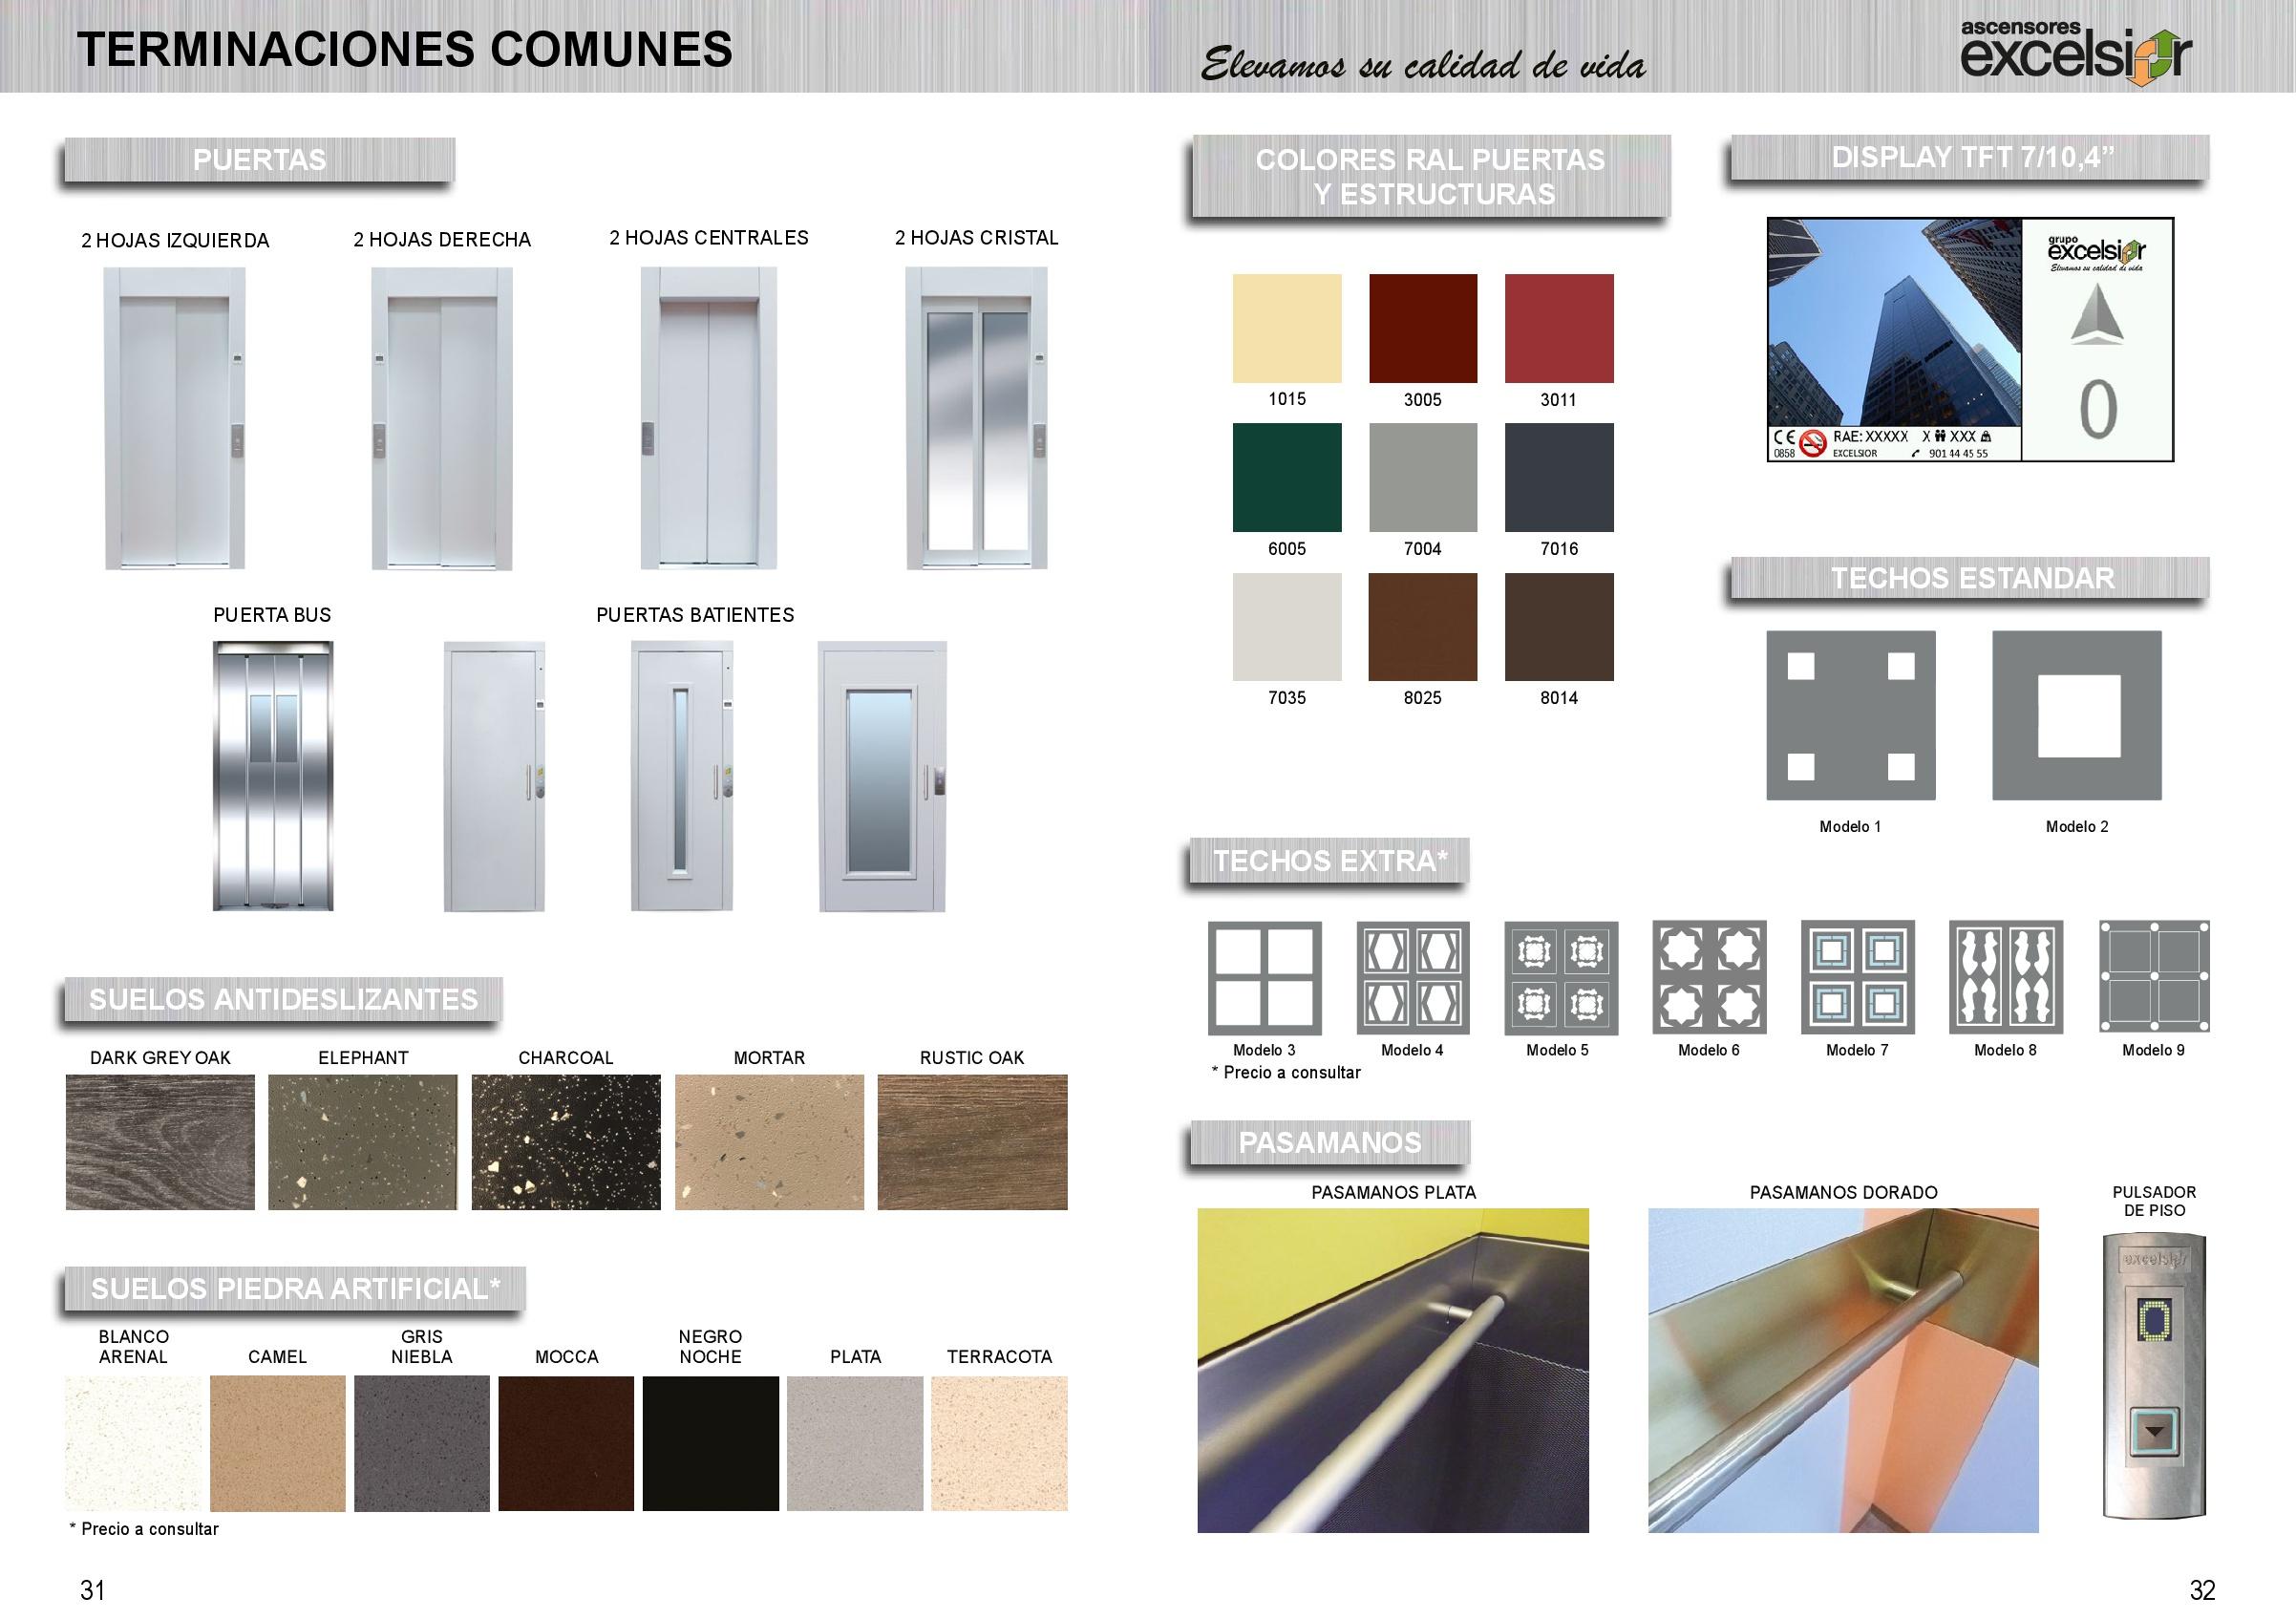 Catálogo de complementos para ascensores residenciales Excelsior